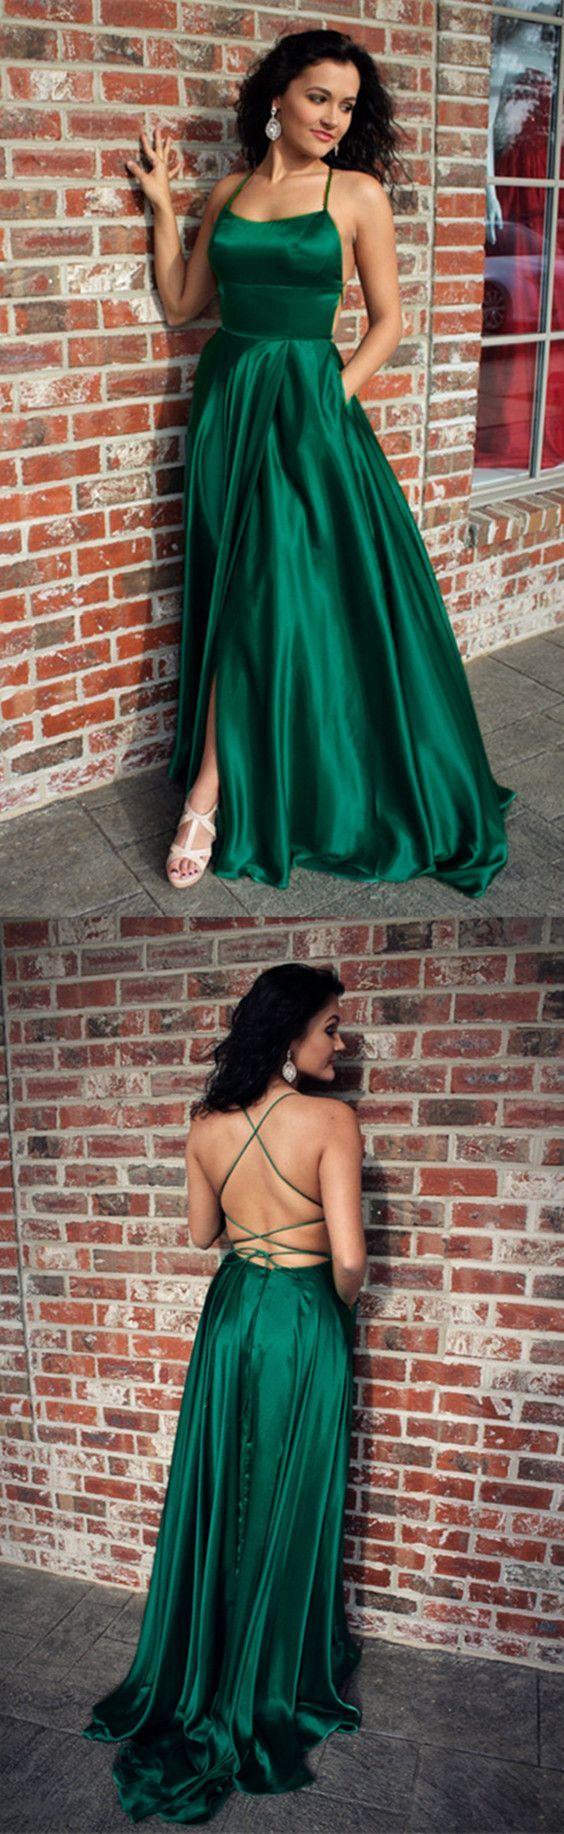 best u formal u images on pinterest short prom dresses ball